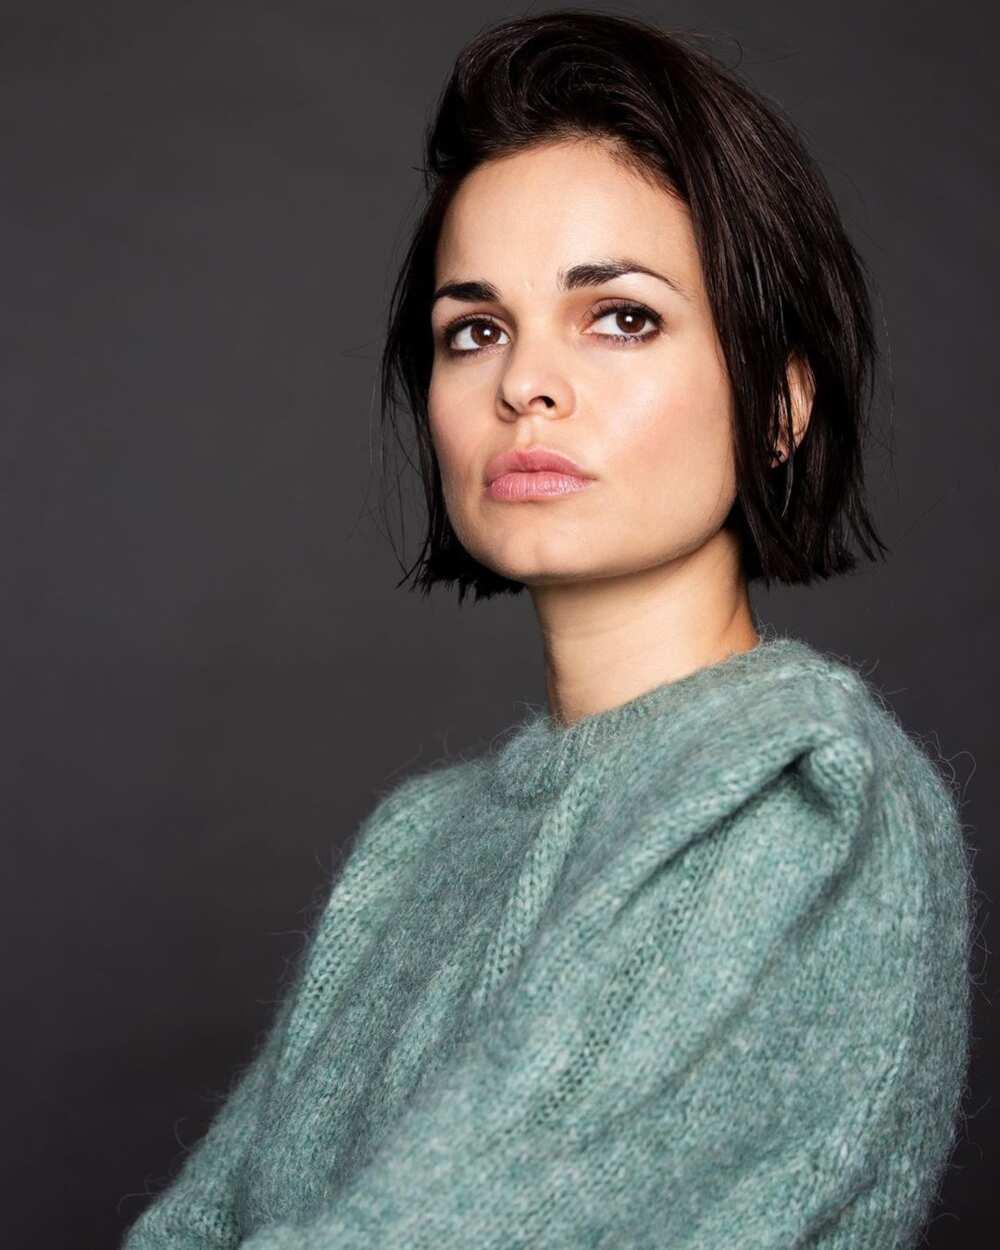 Lina Esco age